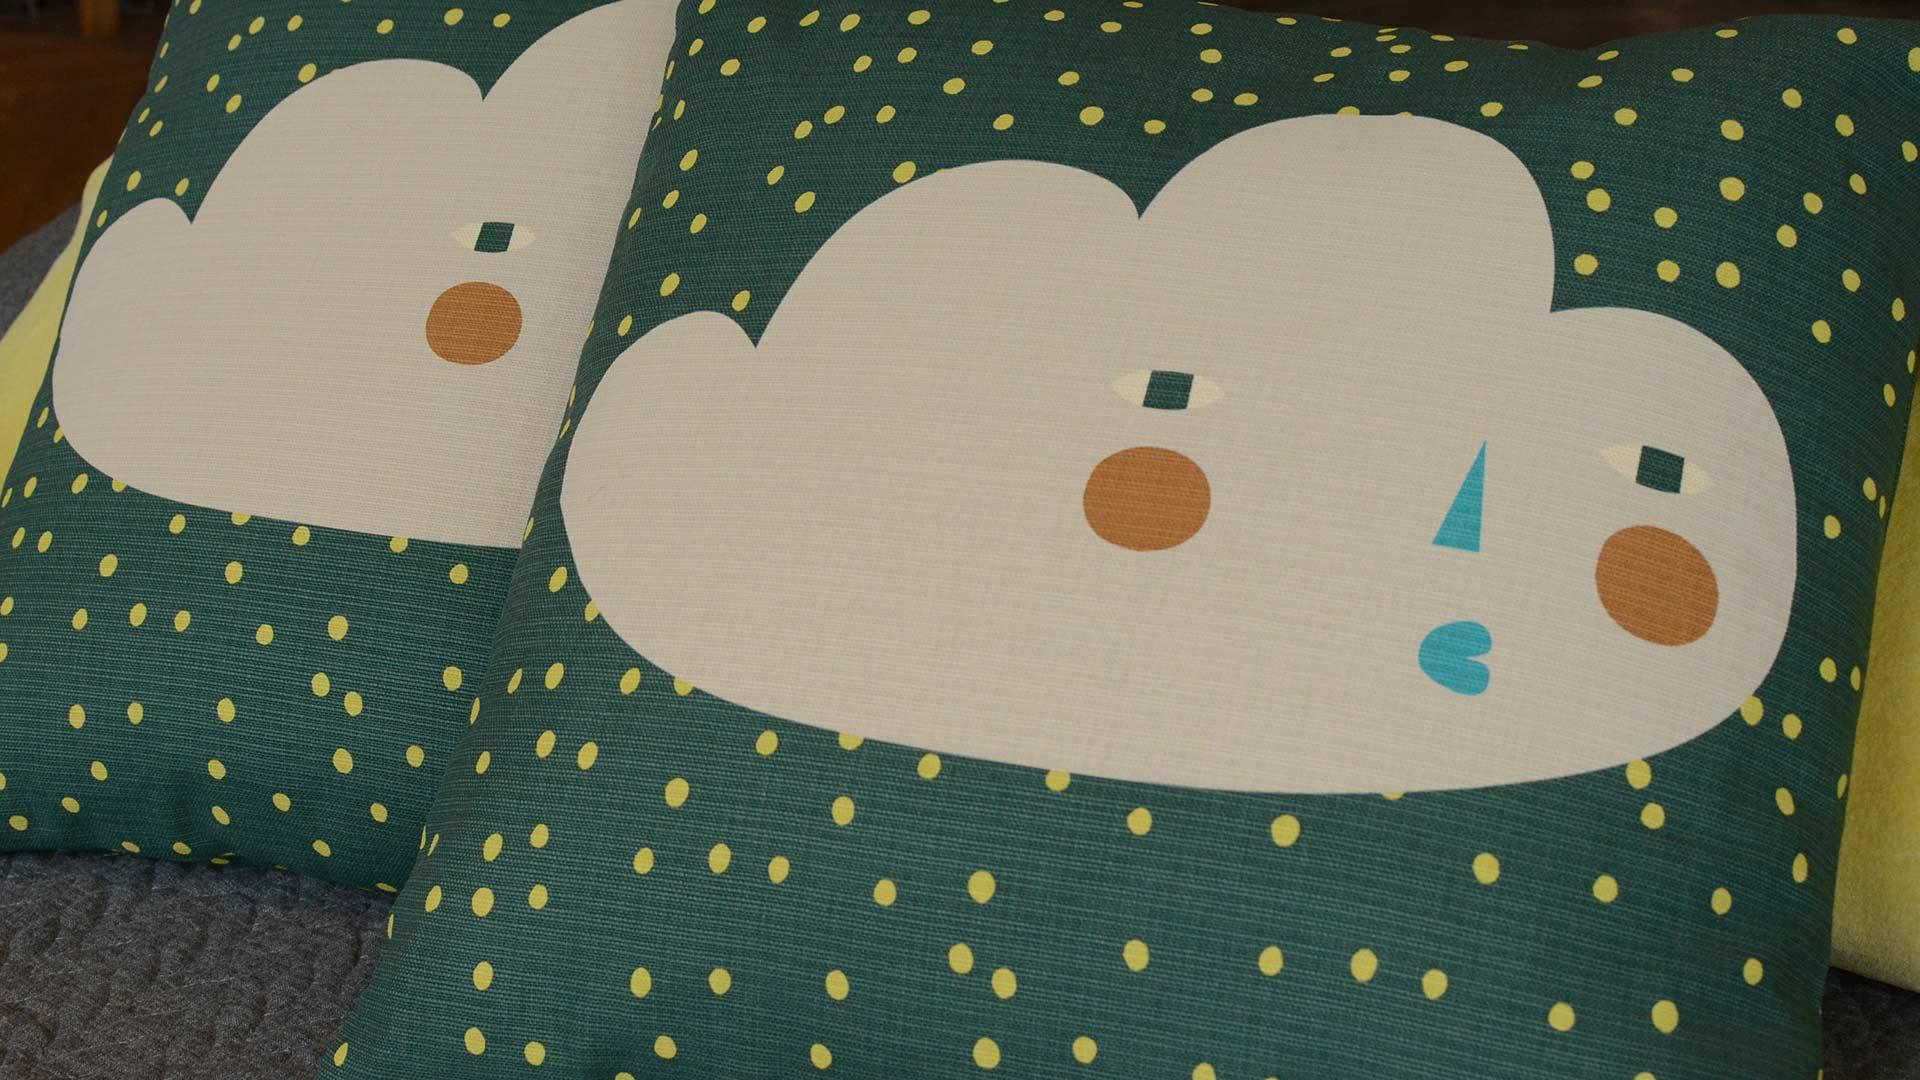 donna-wilson-cushions-cloudy-face